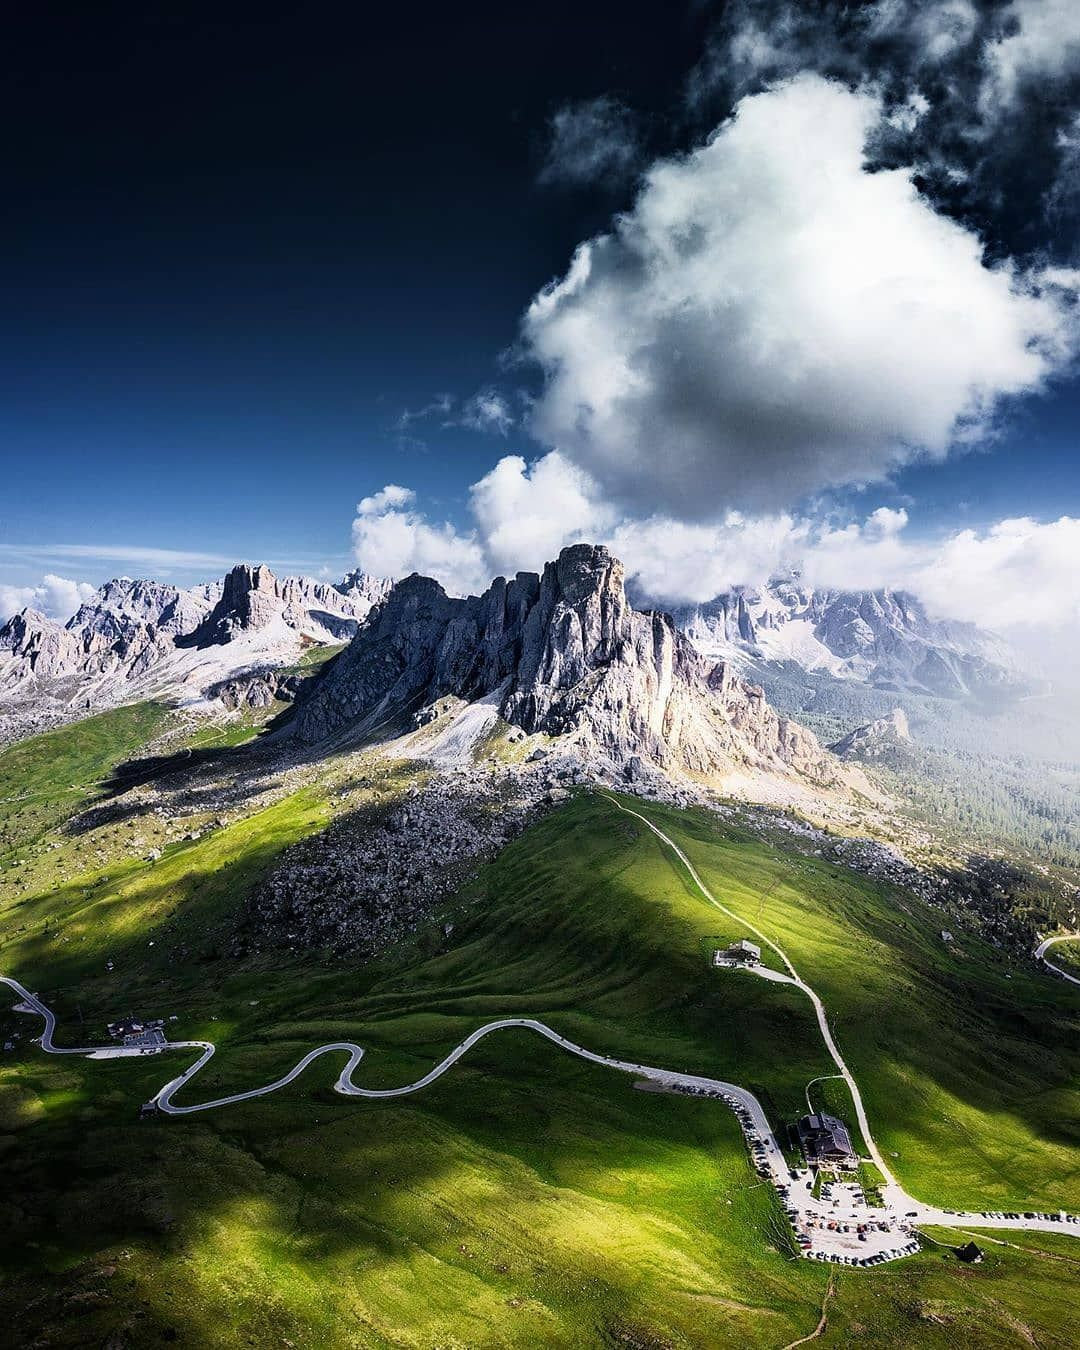 "Planet Earth 🌎 on Instagram: ""Photo by @richardeigenheer_photo The italian dolomites. #Italy #Travel #Nature #Place #Planet #TLpicks #Worldshotz #Superhubs #Dolomites…"""